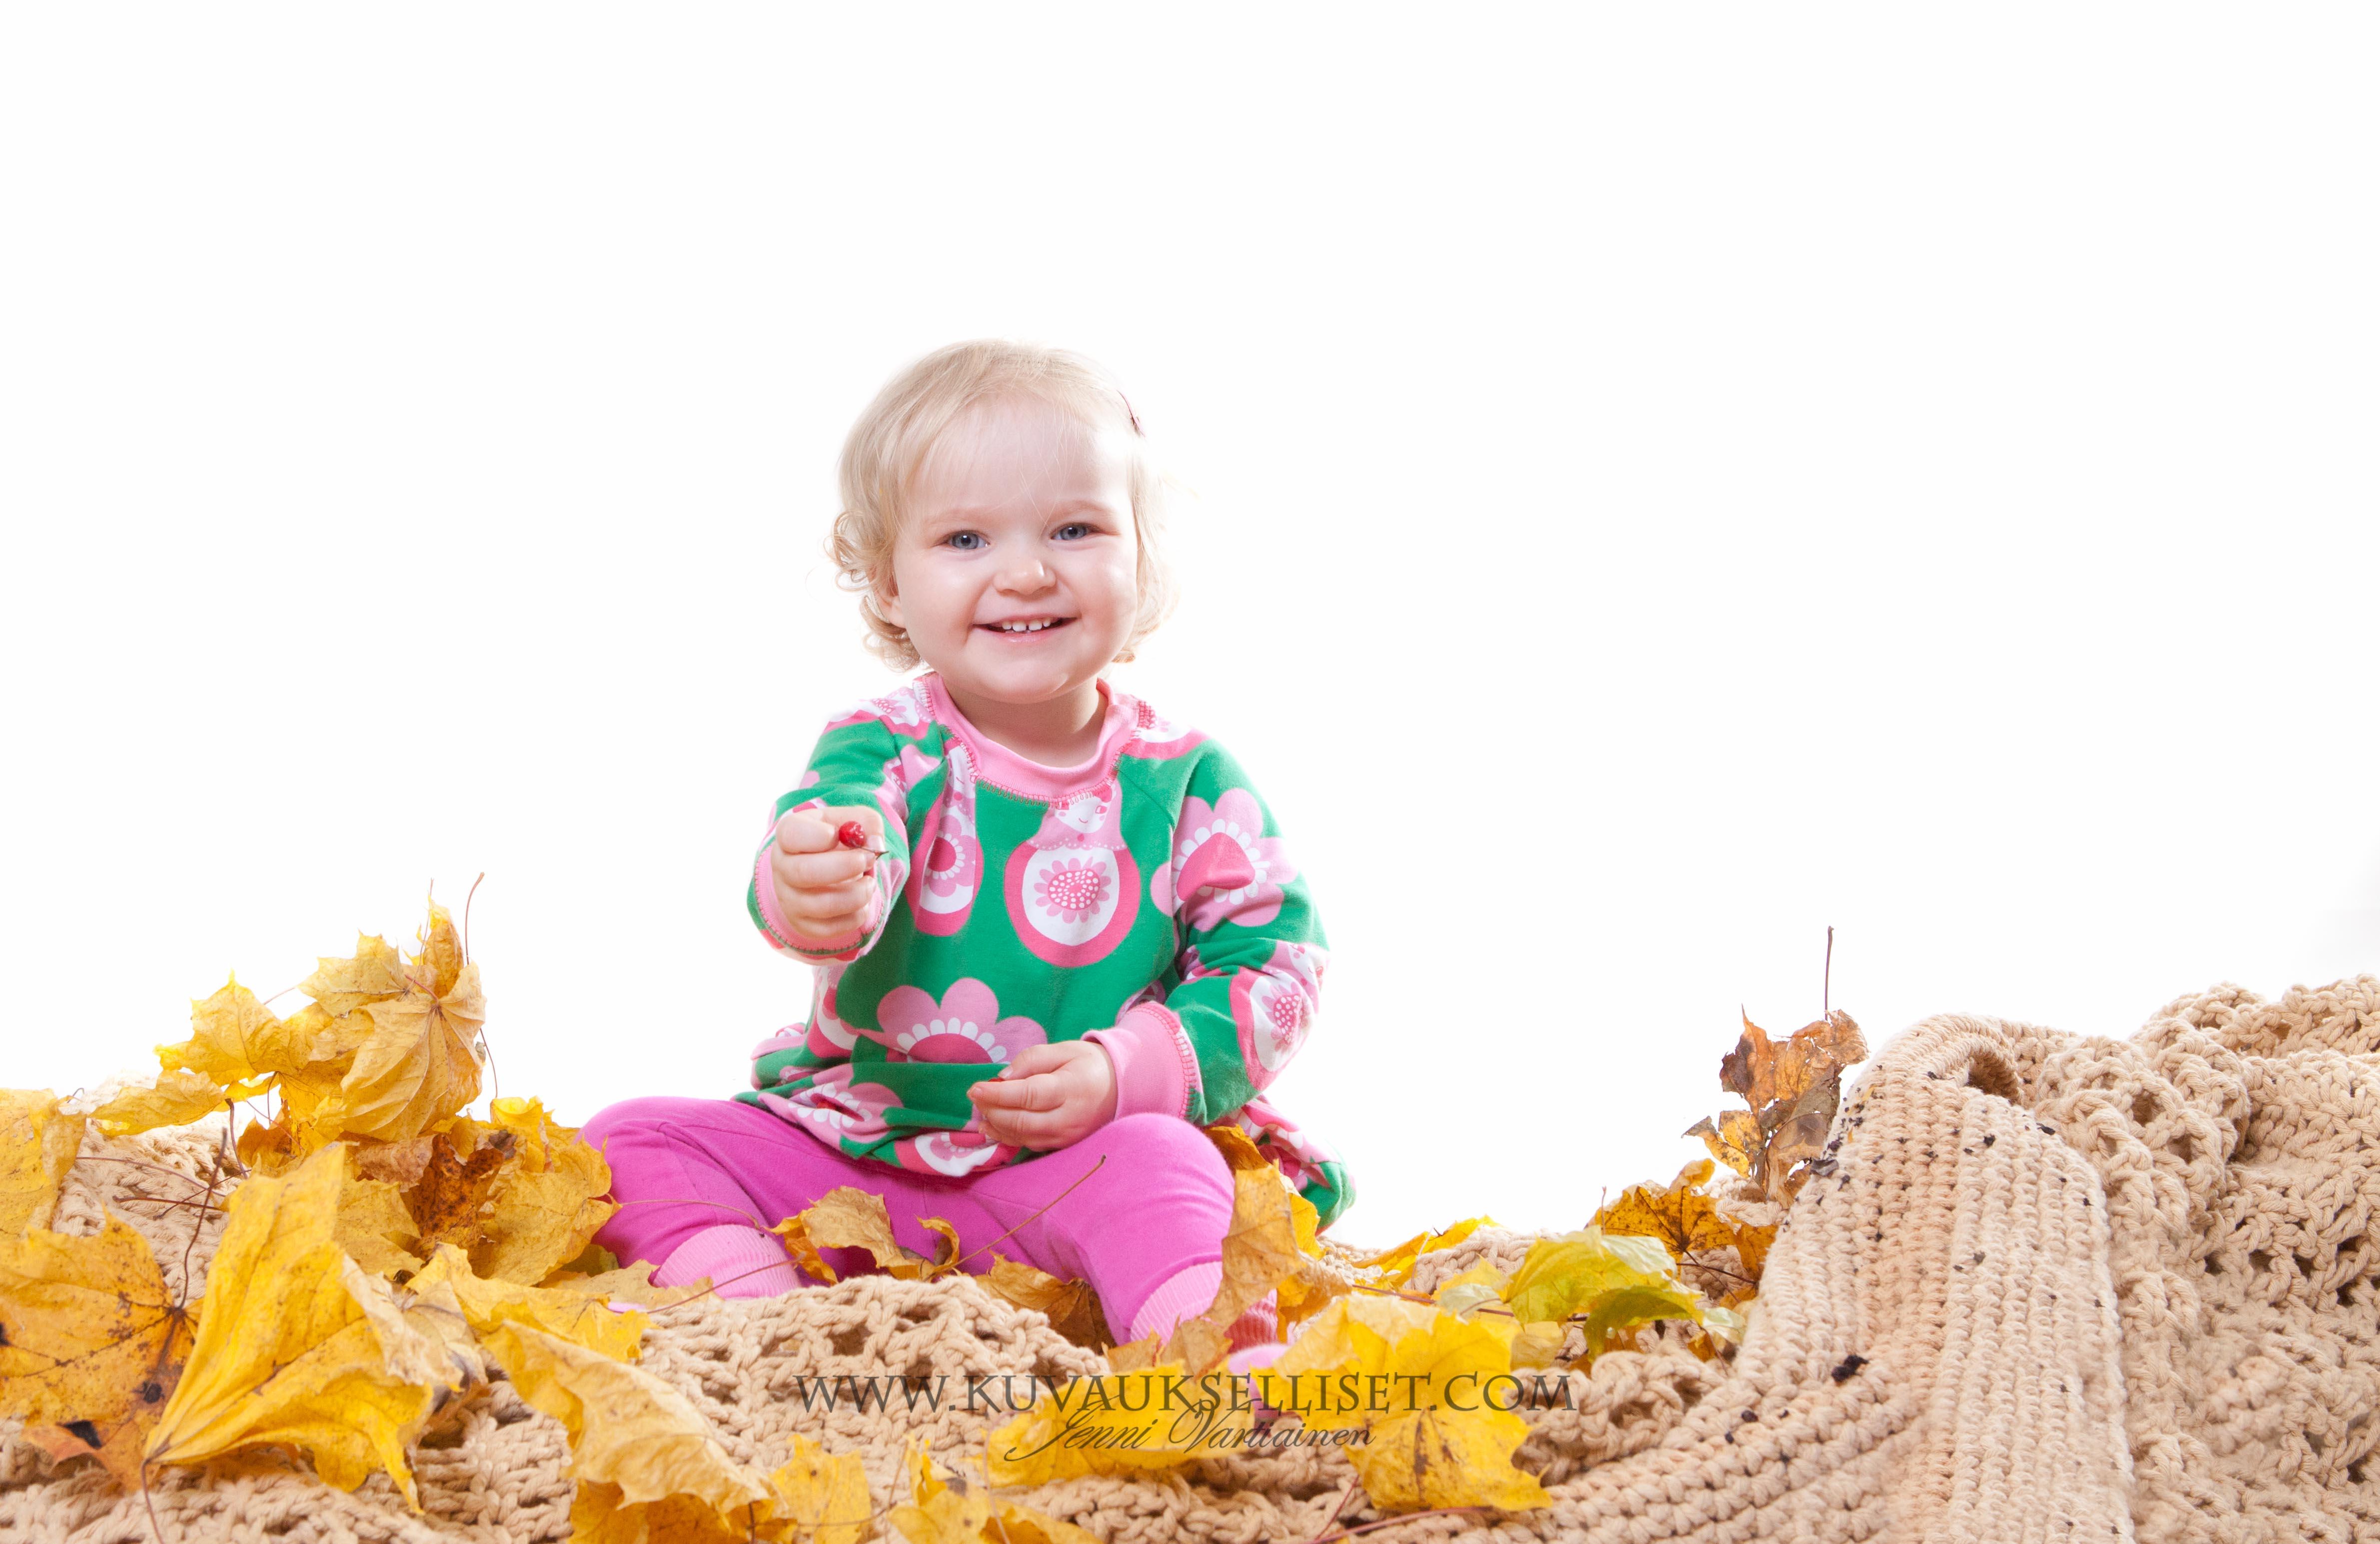 2014.10.19 Perhekuvaus lapsikuvaus studiokuvaus sisaruskuvaus 1-vuotiskuvaus muotokuva-5